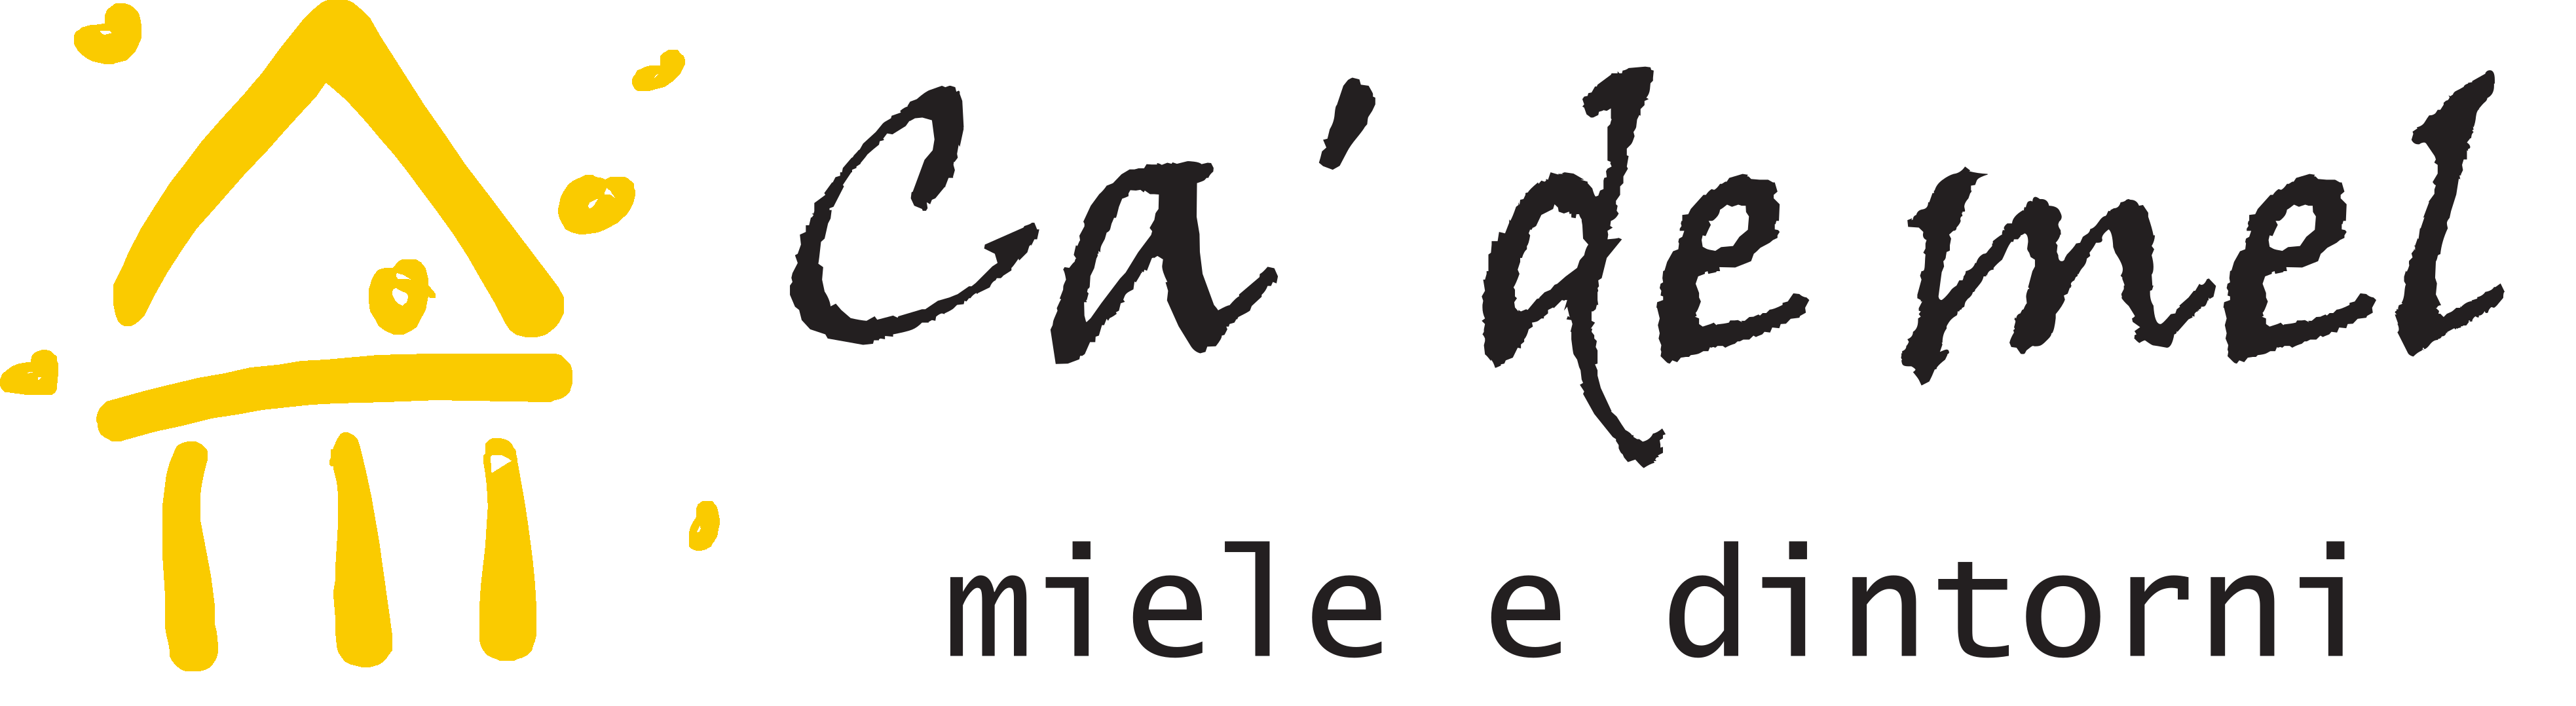 Cademel